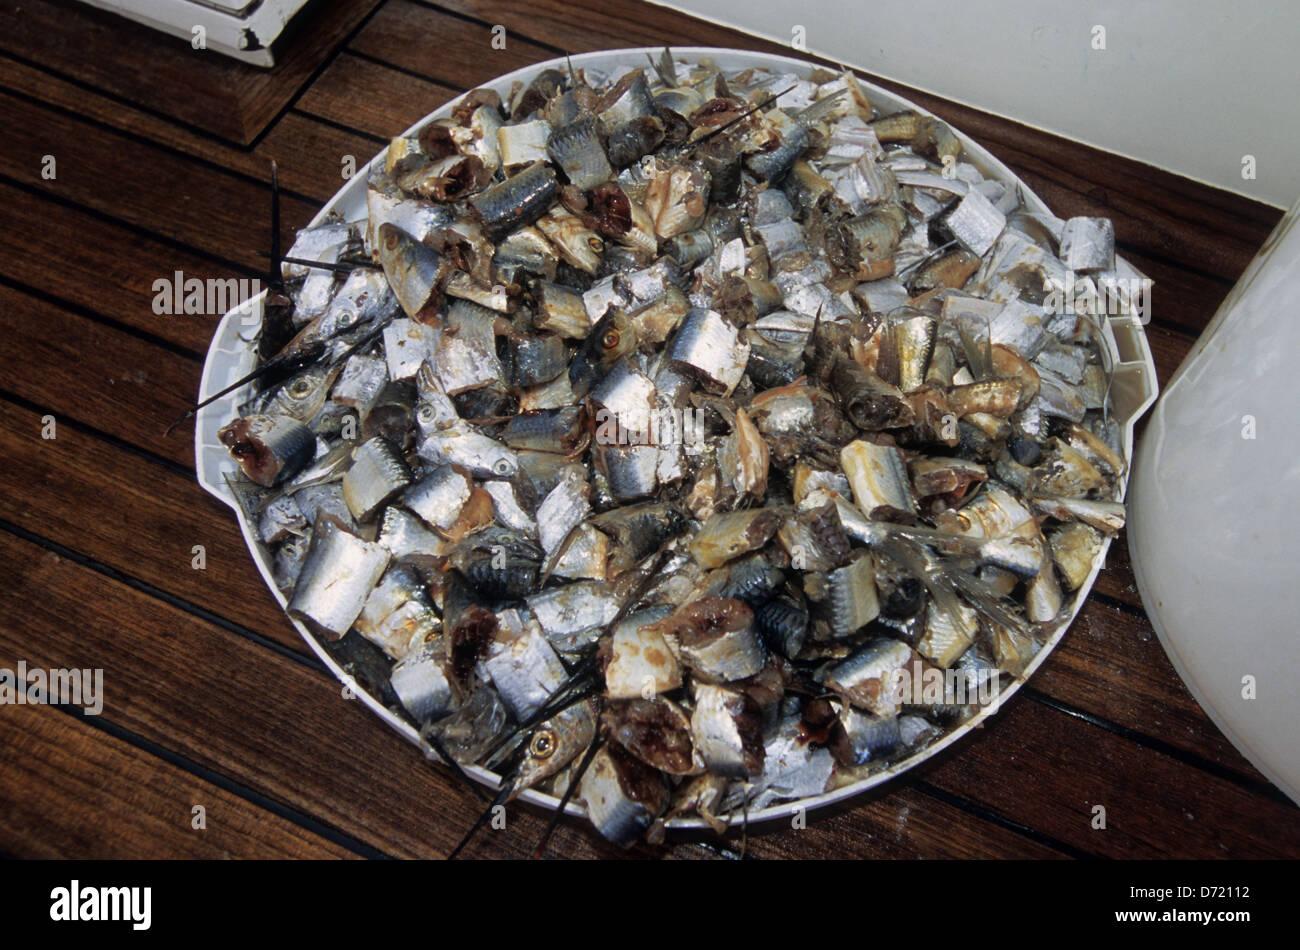 chum used for offshore and deep sea fishing near port aransas texas